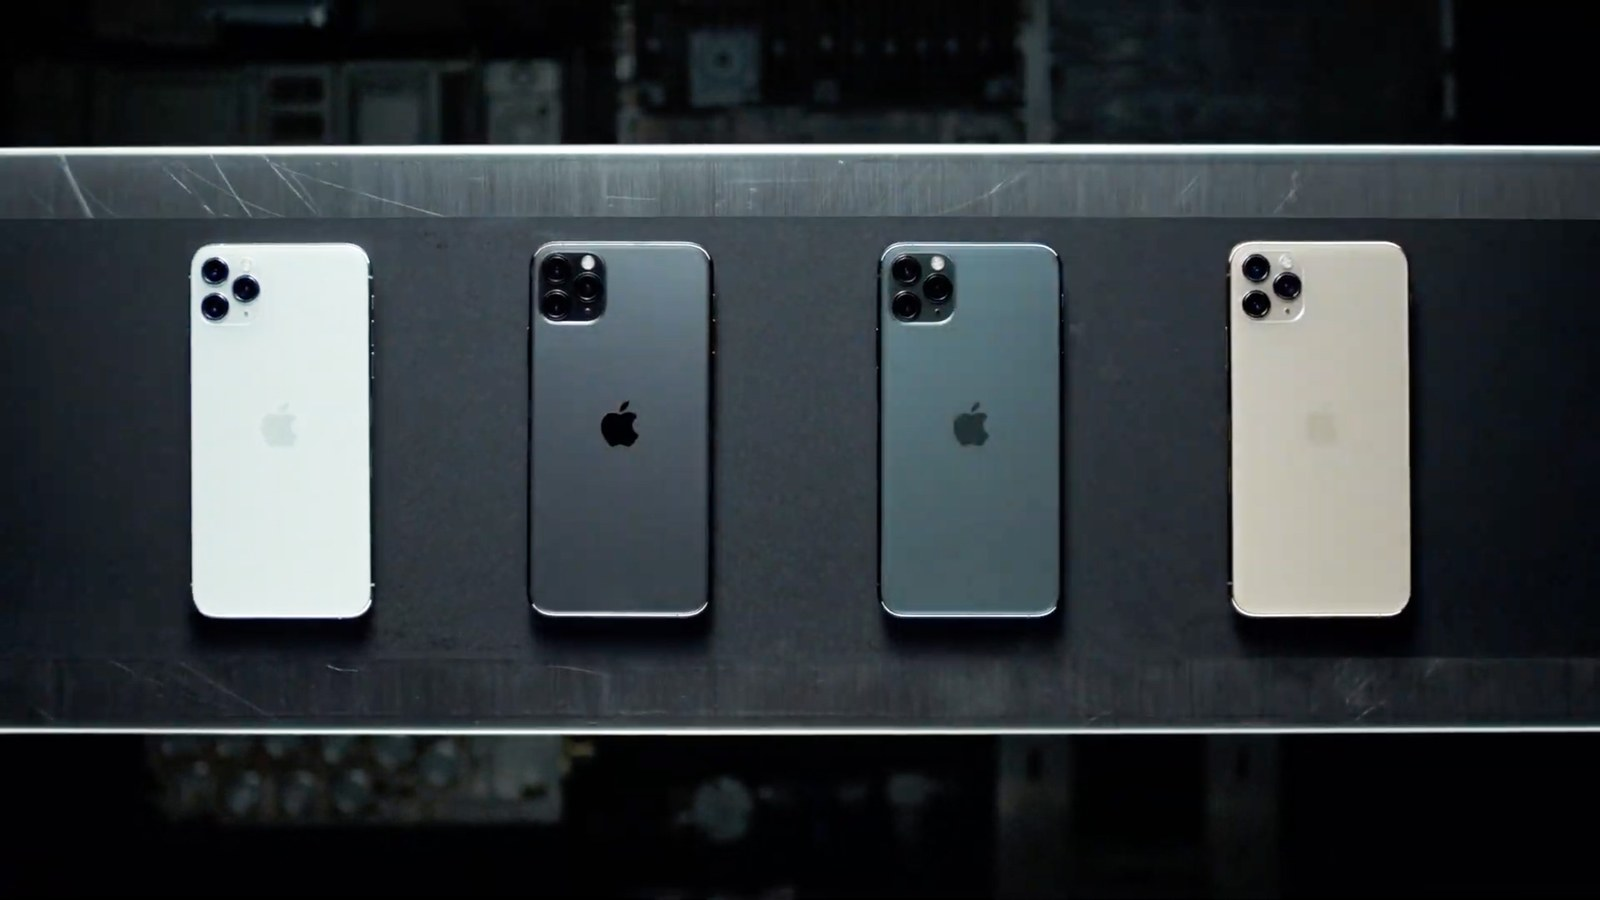 iPhone-11-Pro-Inline.jpg